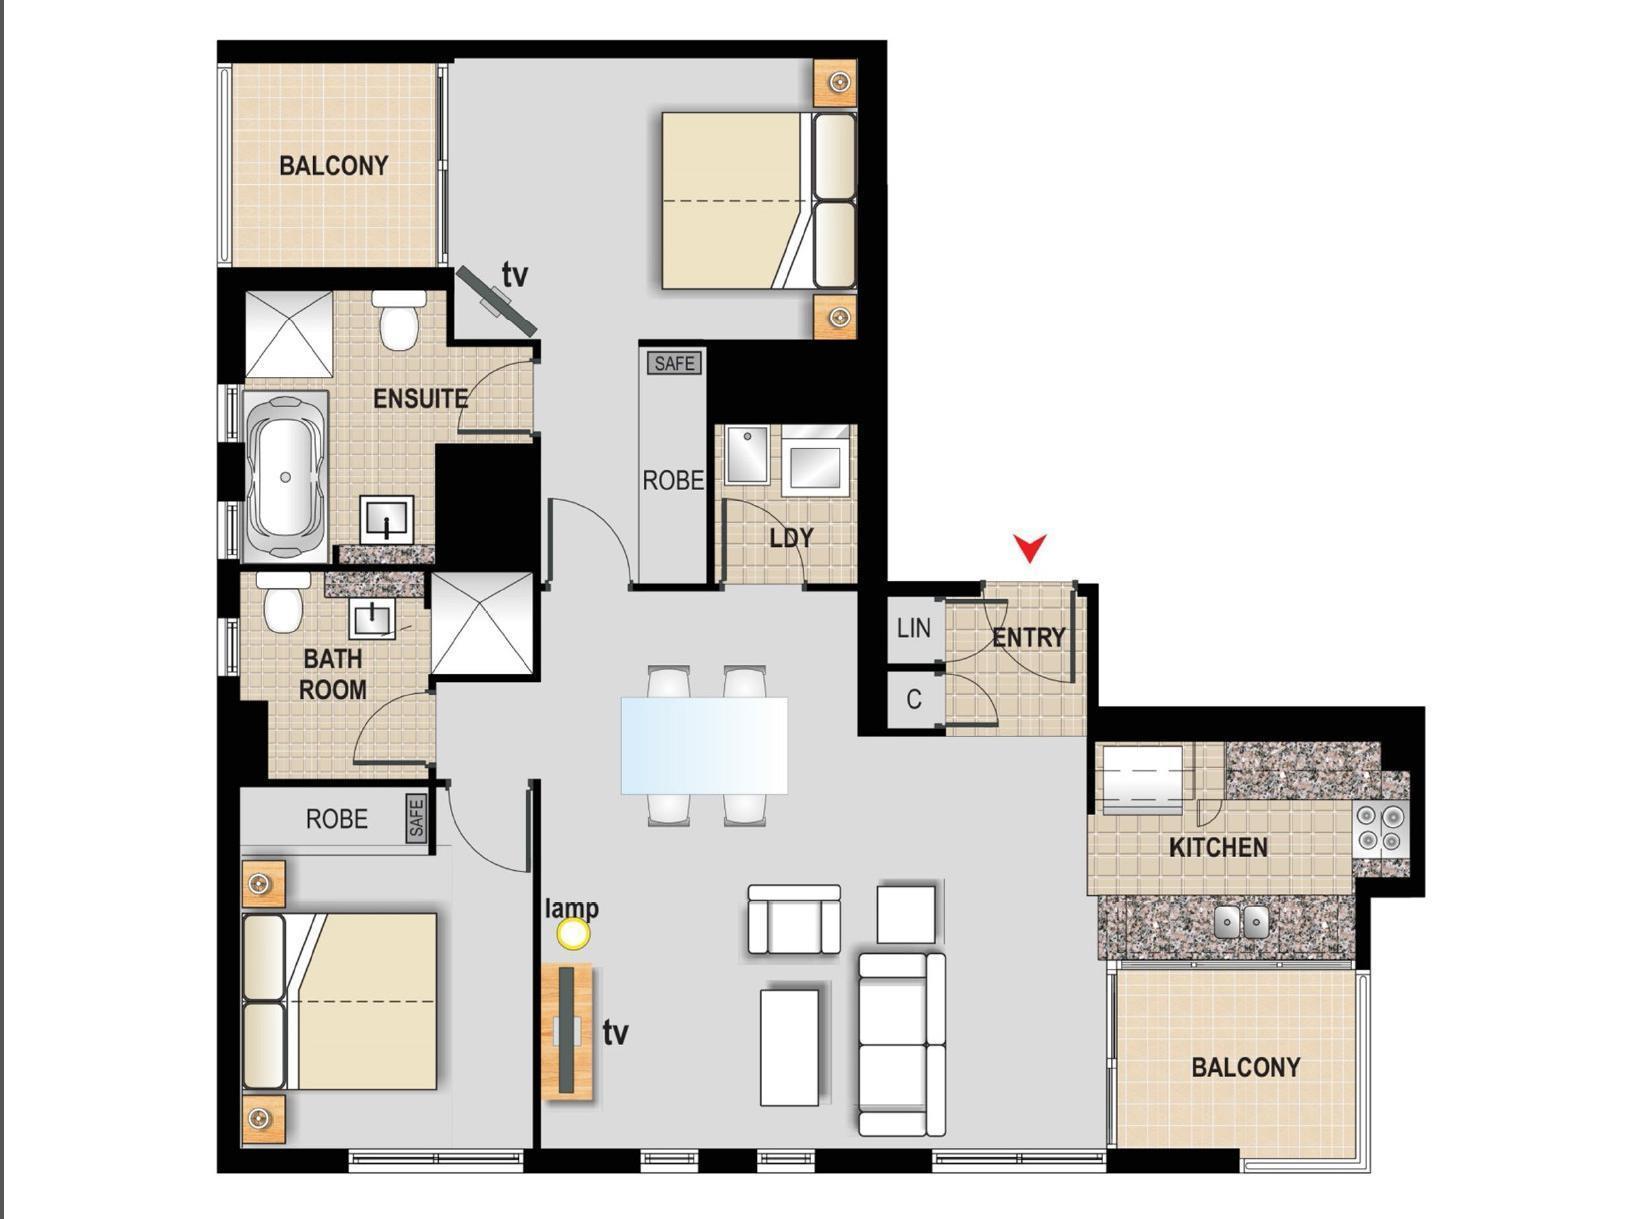 Australia Hotel Accommodation Cheap   Floor Plans